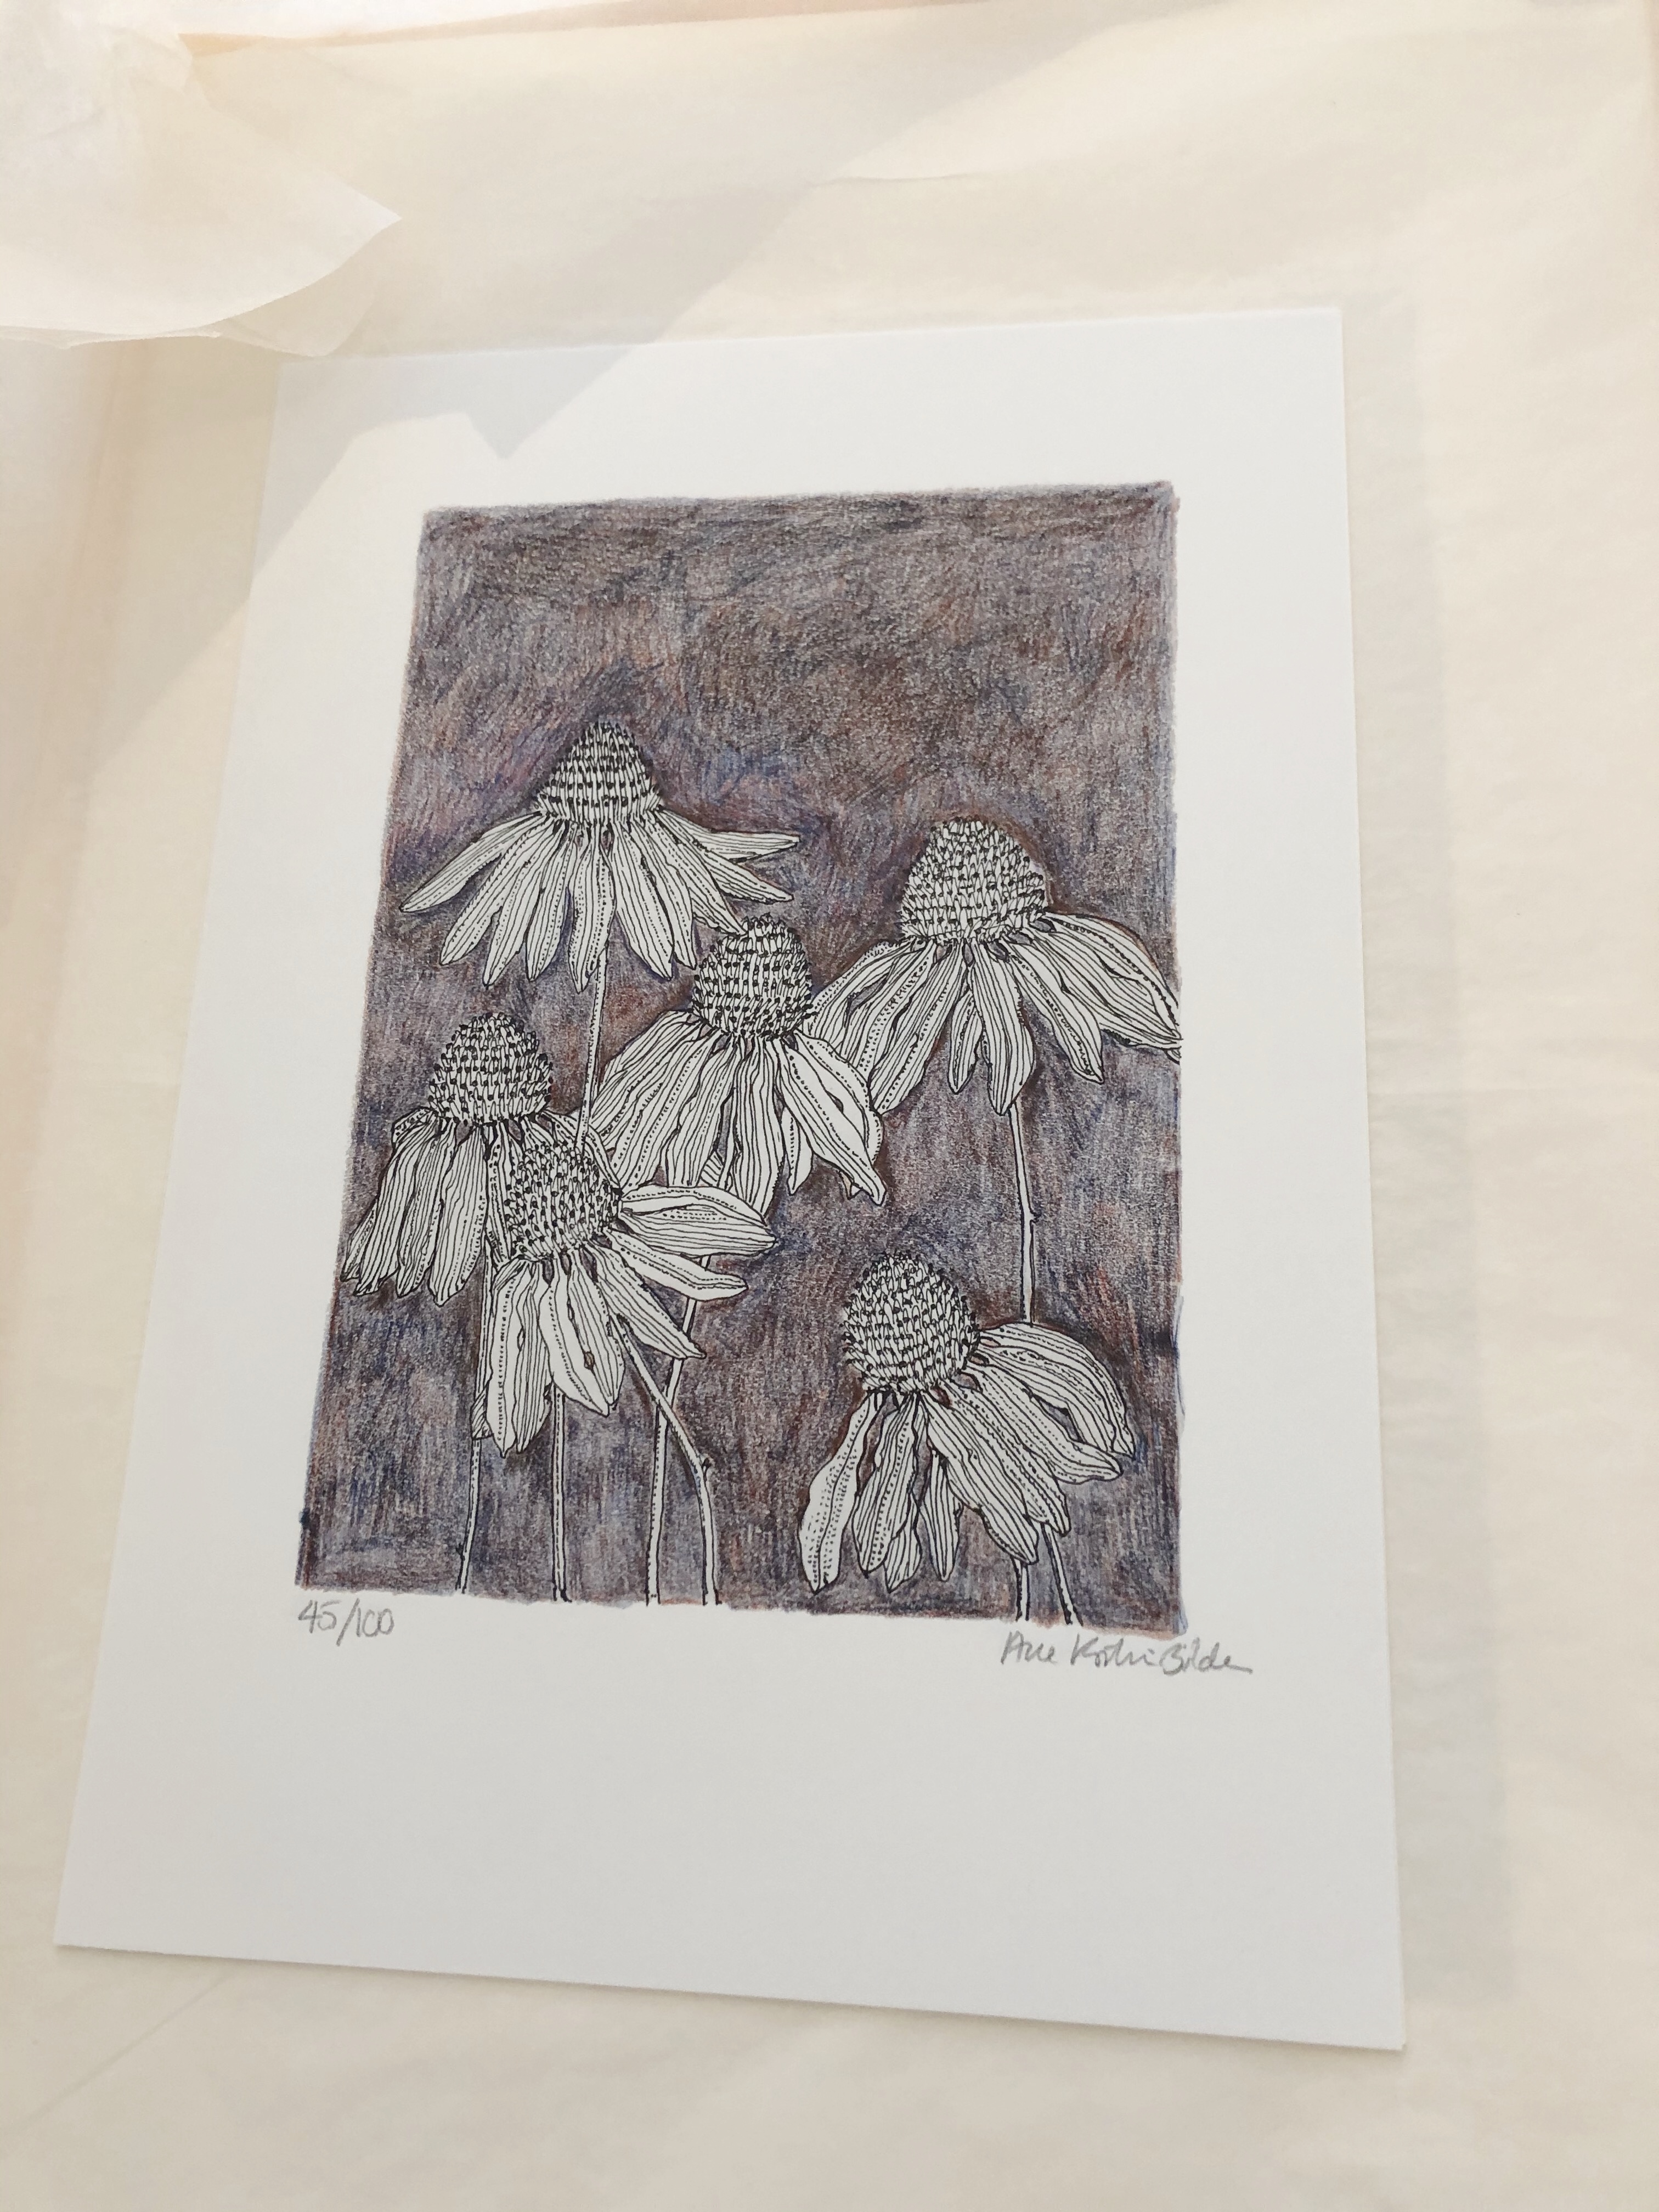 Ane Kirstine Bilde /  Echinacea Artprint